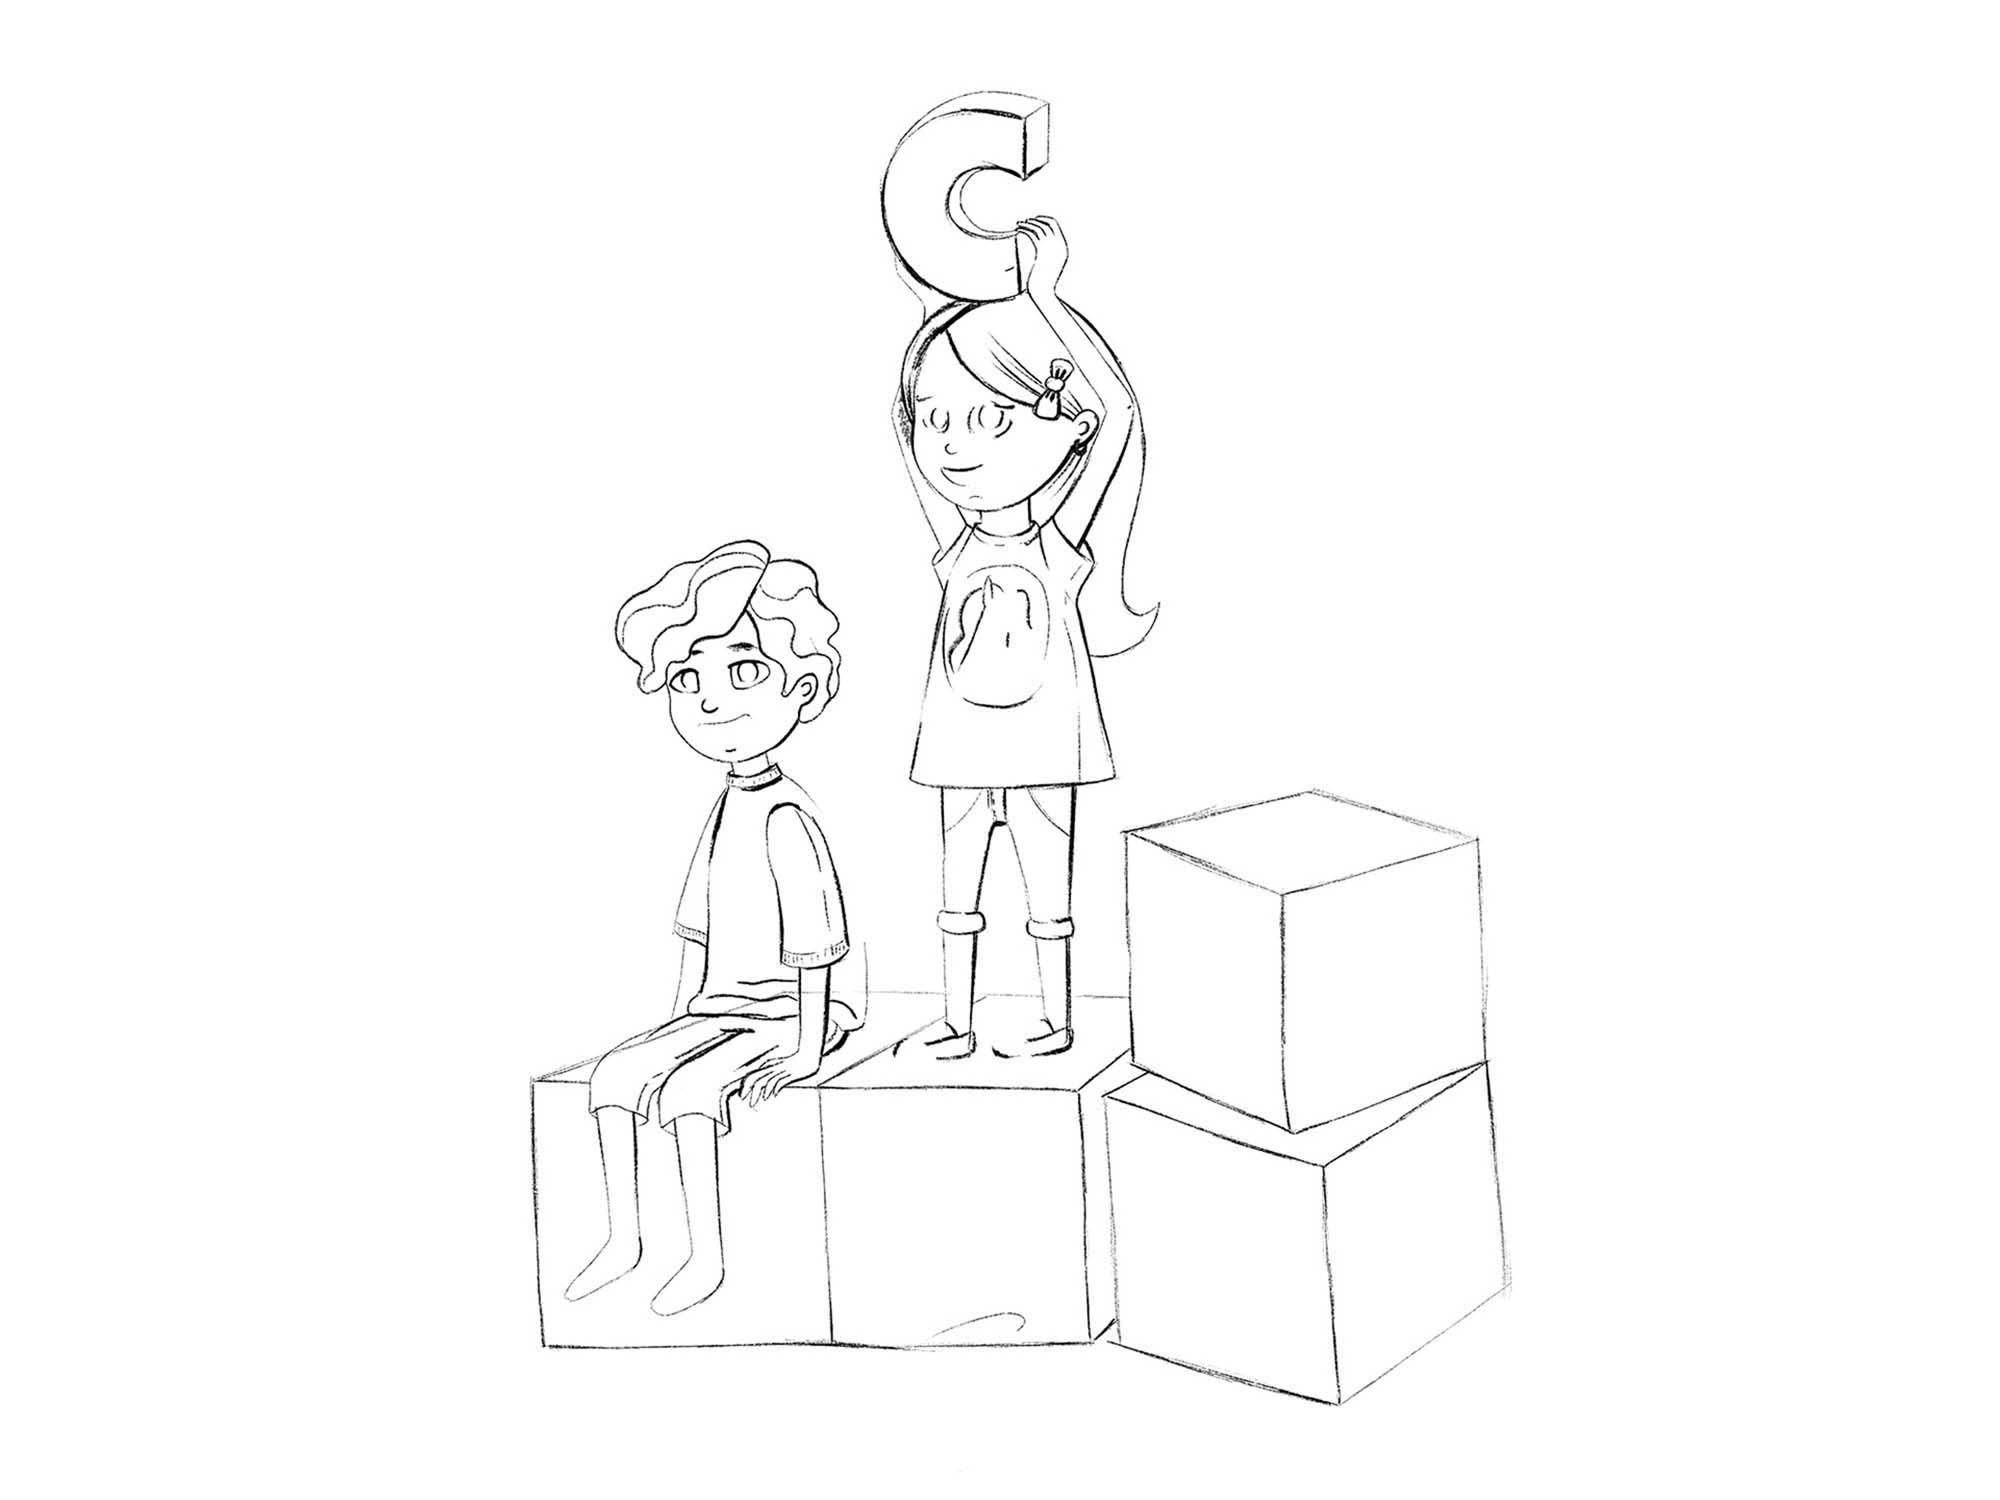 Children Education Illustration 2